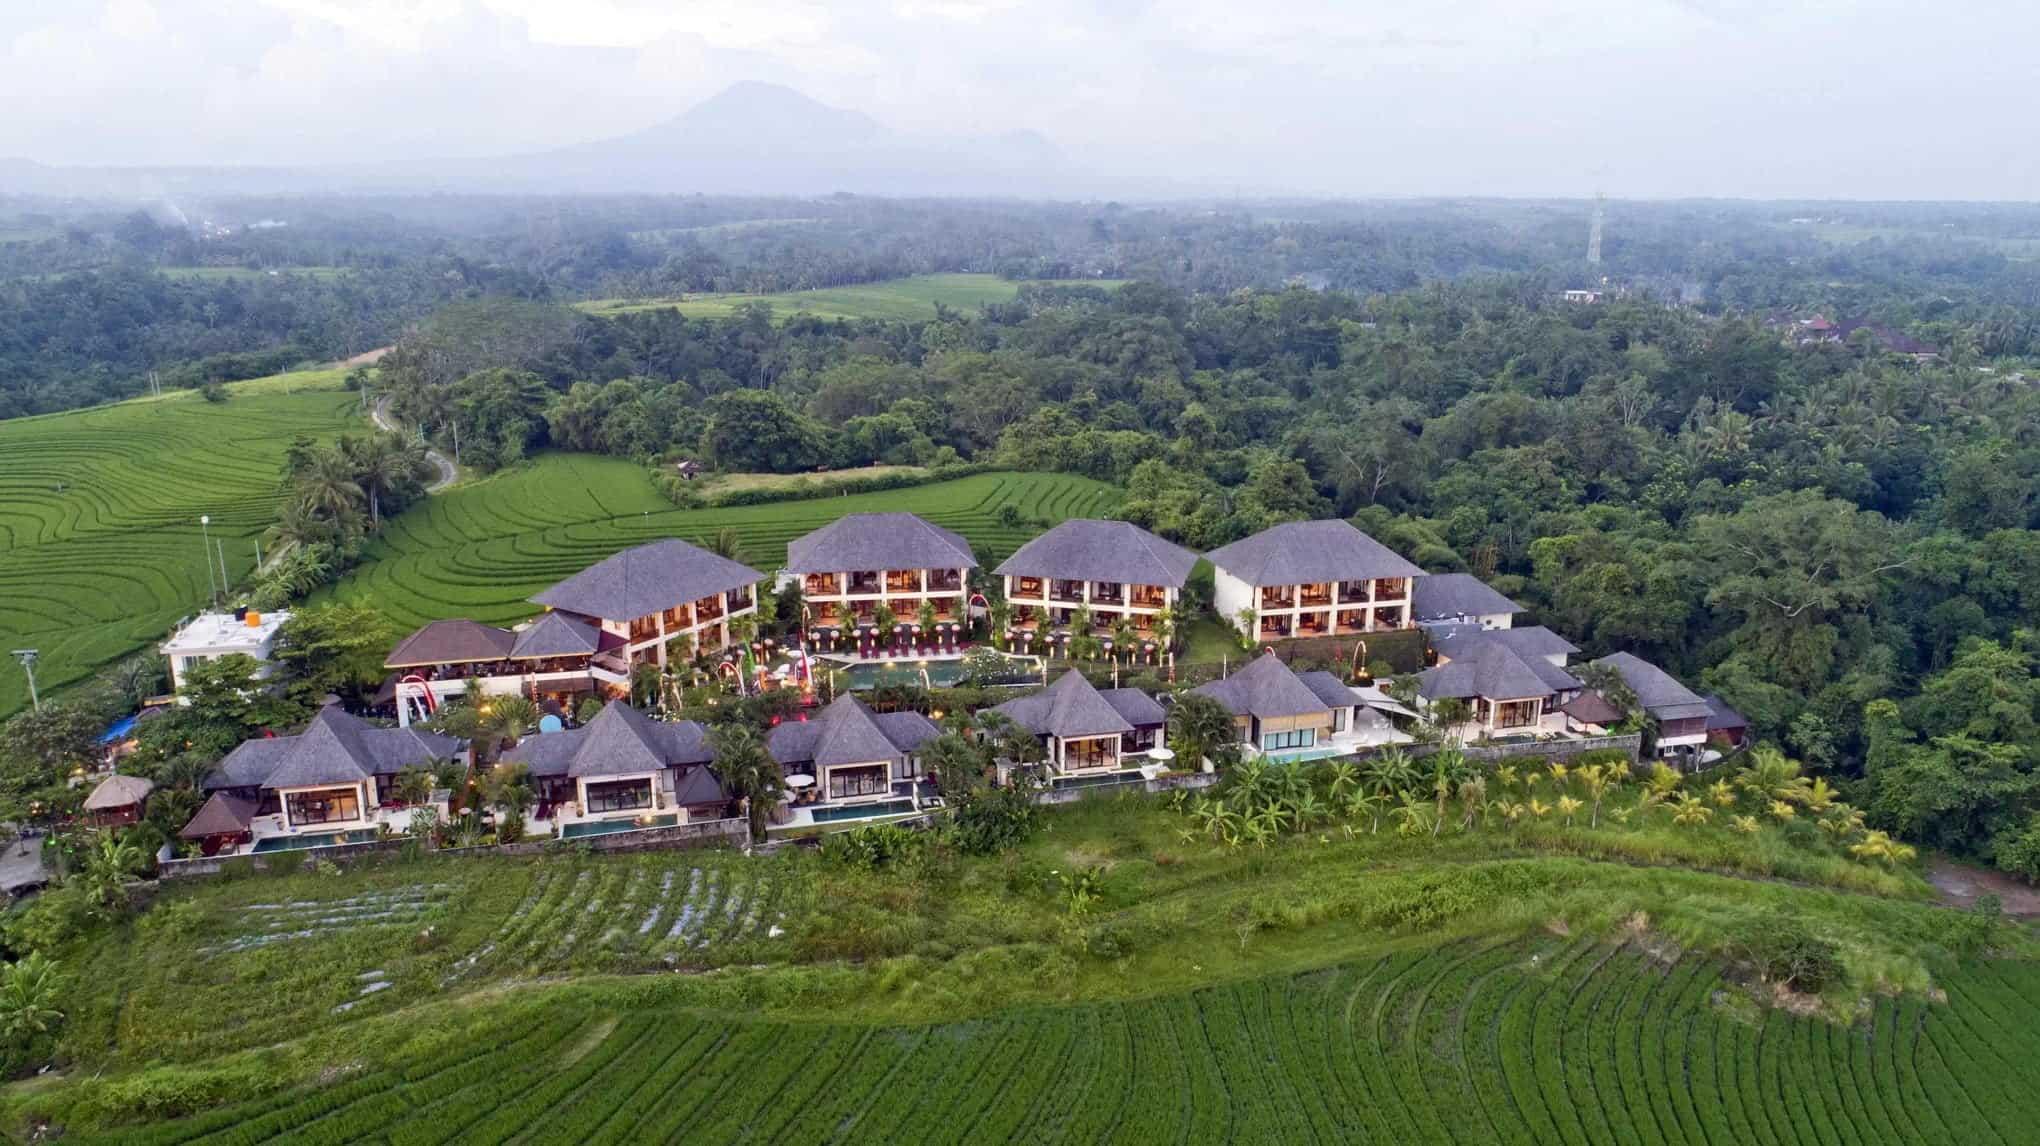 sahaja sawah resort aerial bali vacation homes